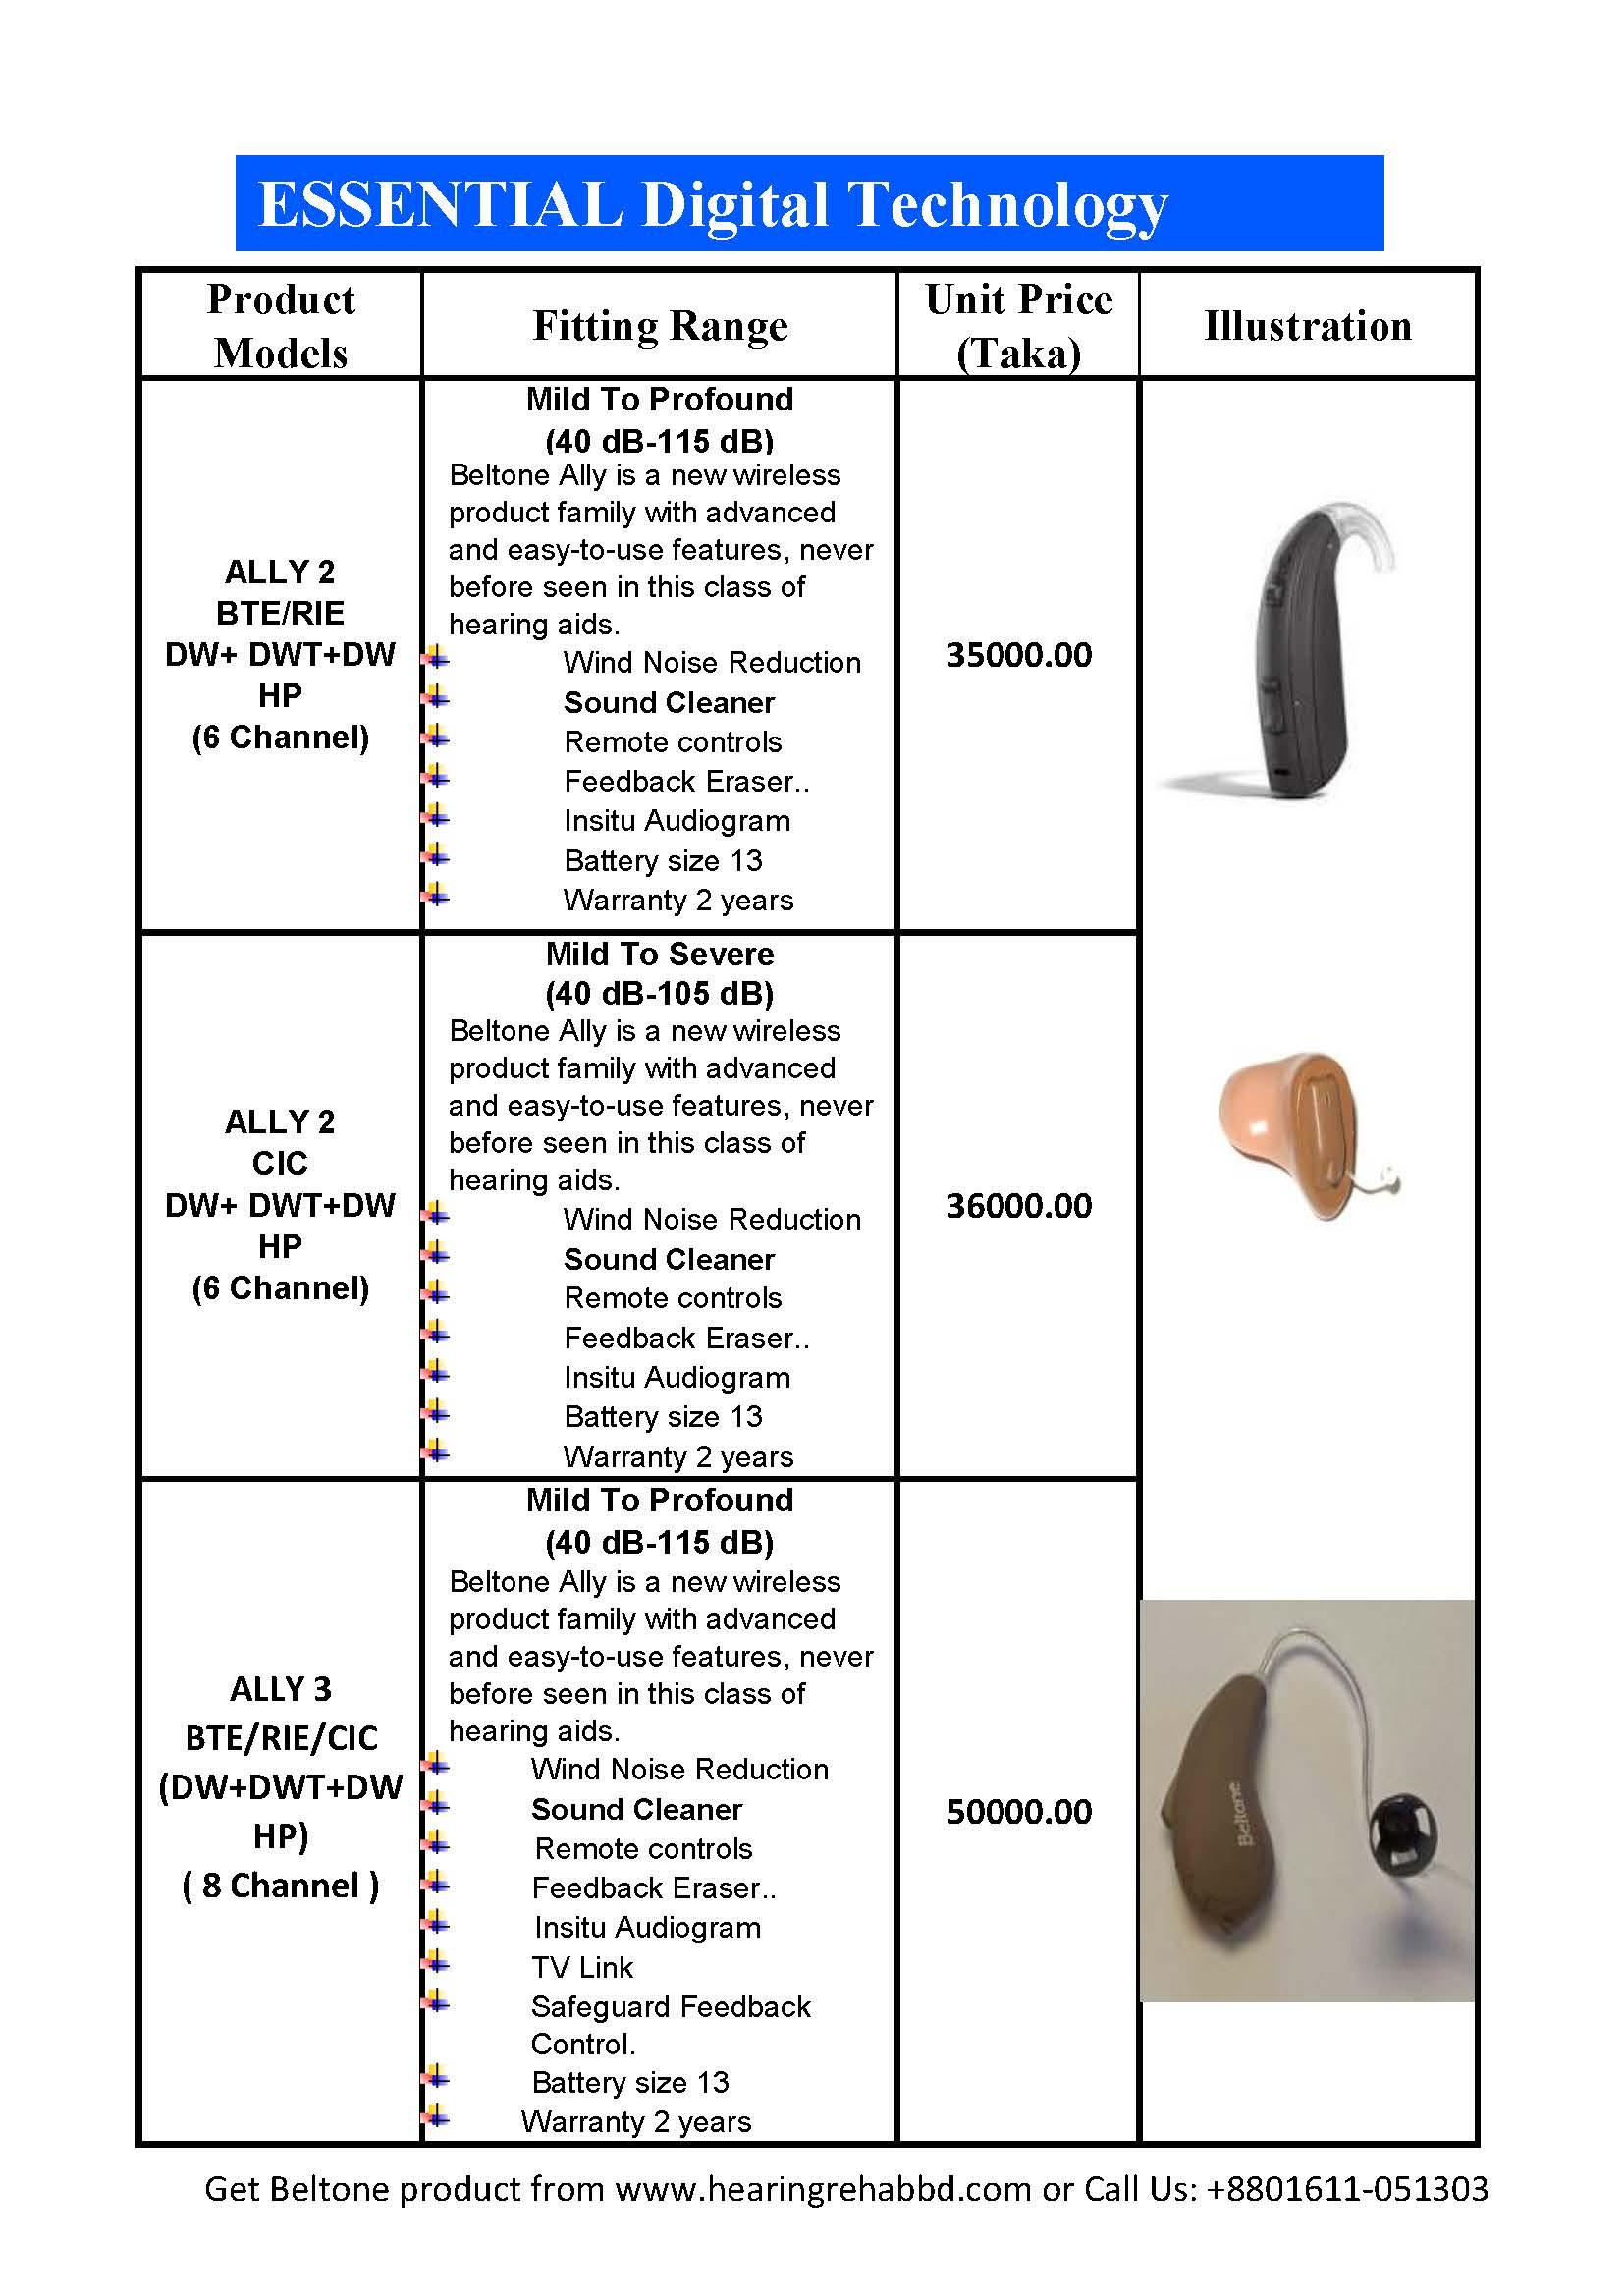 Beltone Price List Download Here Hearing Rehab Bd